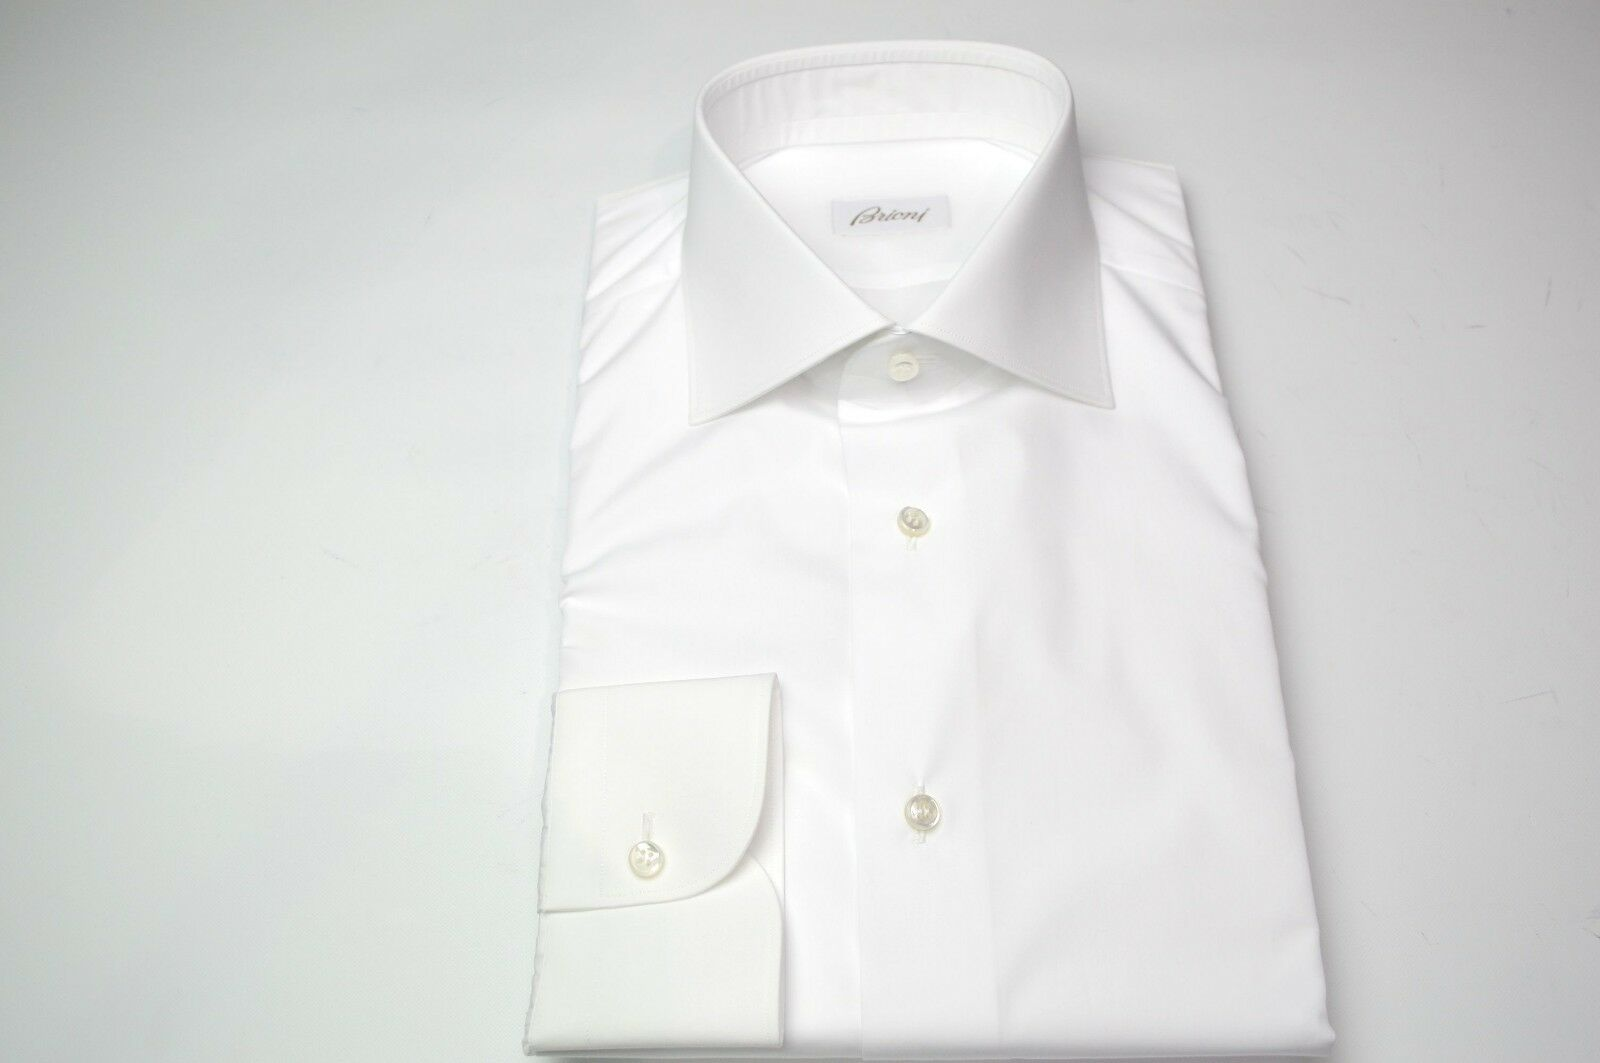 NEW BRIONI Weiß Dress hemd 100% baumwolle Größe 15.5 Us 39 Eu  (MA57)